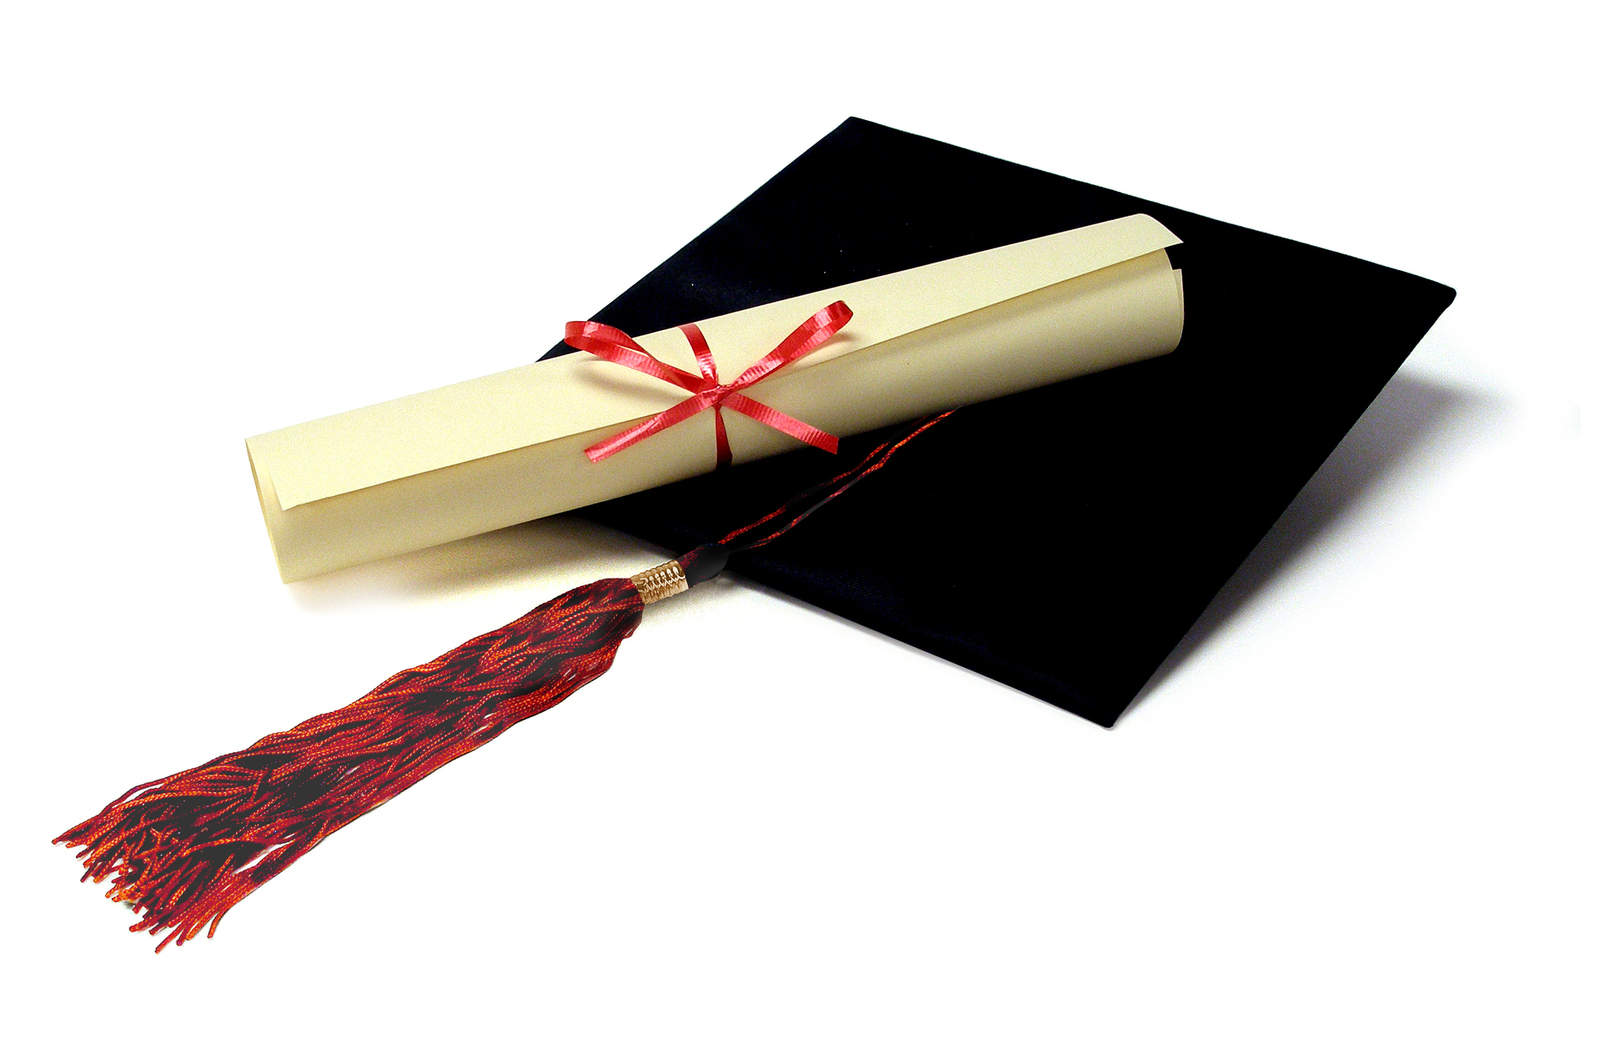 coaching credentials are important graduating graphic